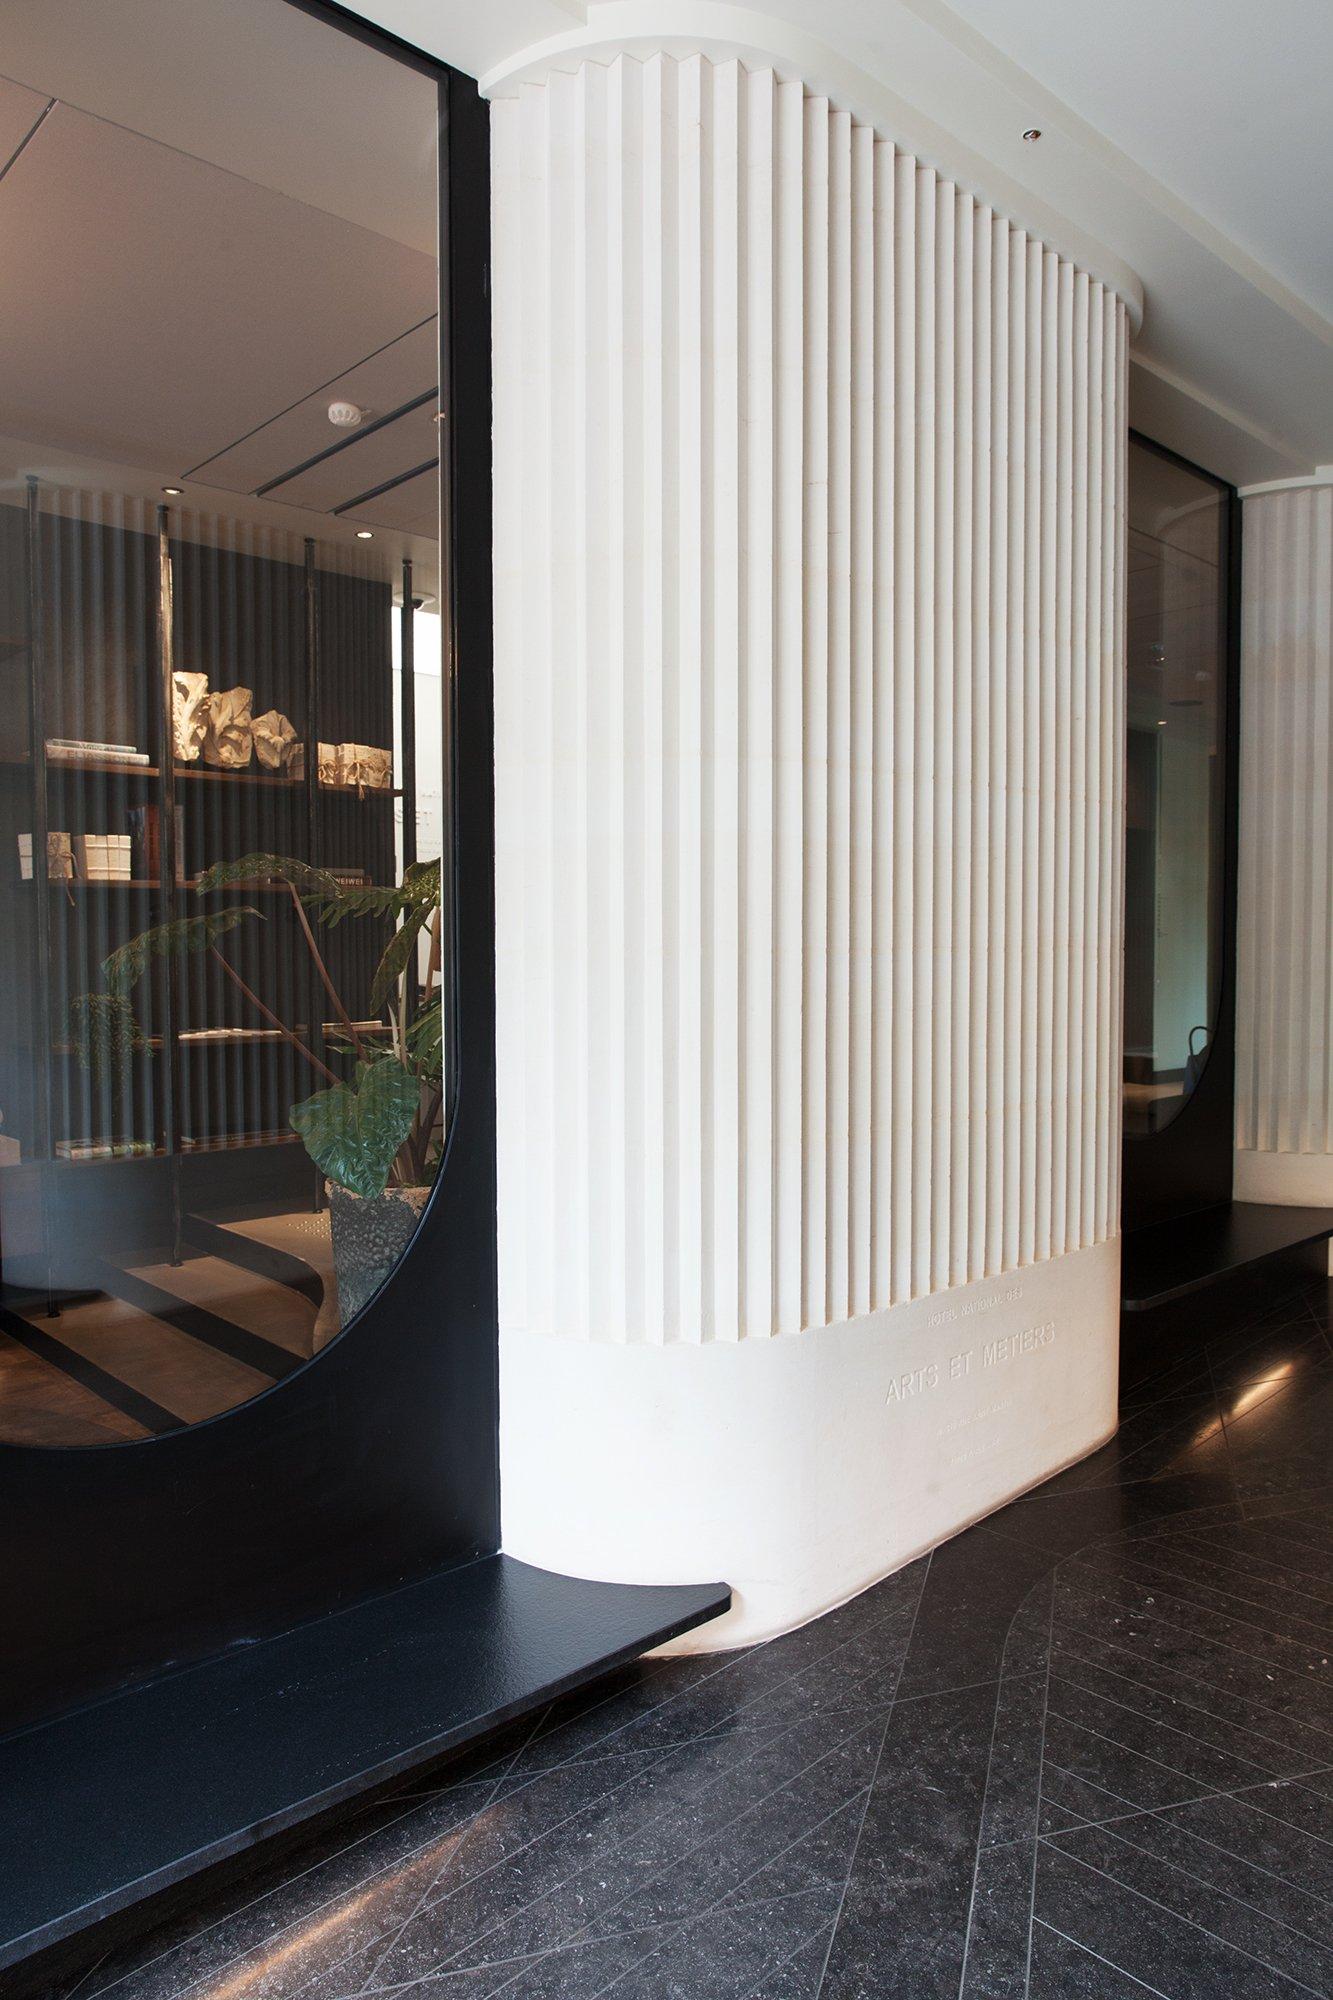 L 39 h tel national des arts et m tiers timeless art of for Hotel design 75003